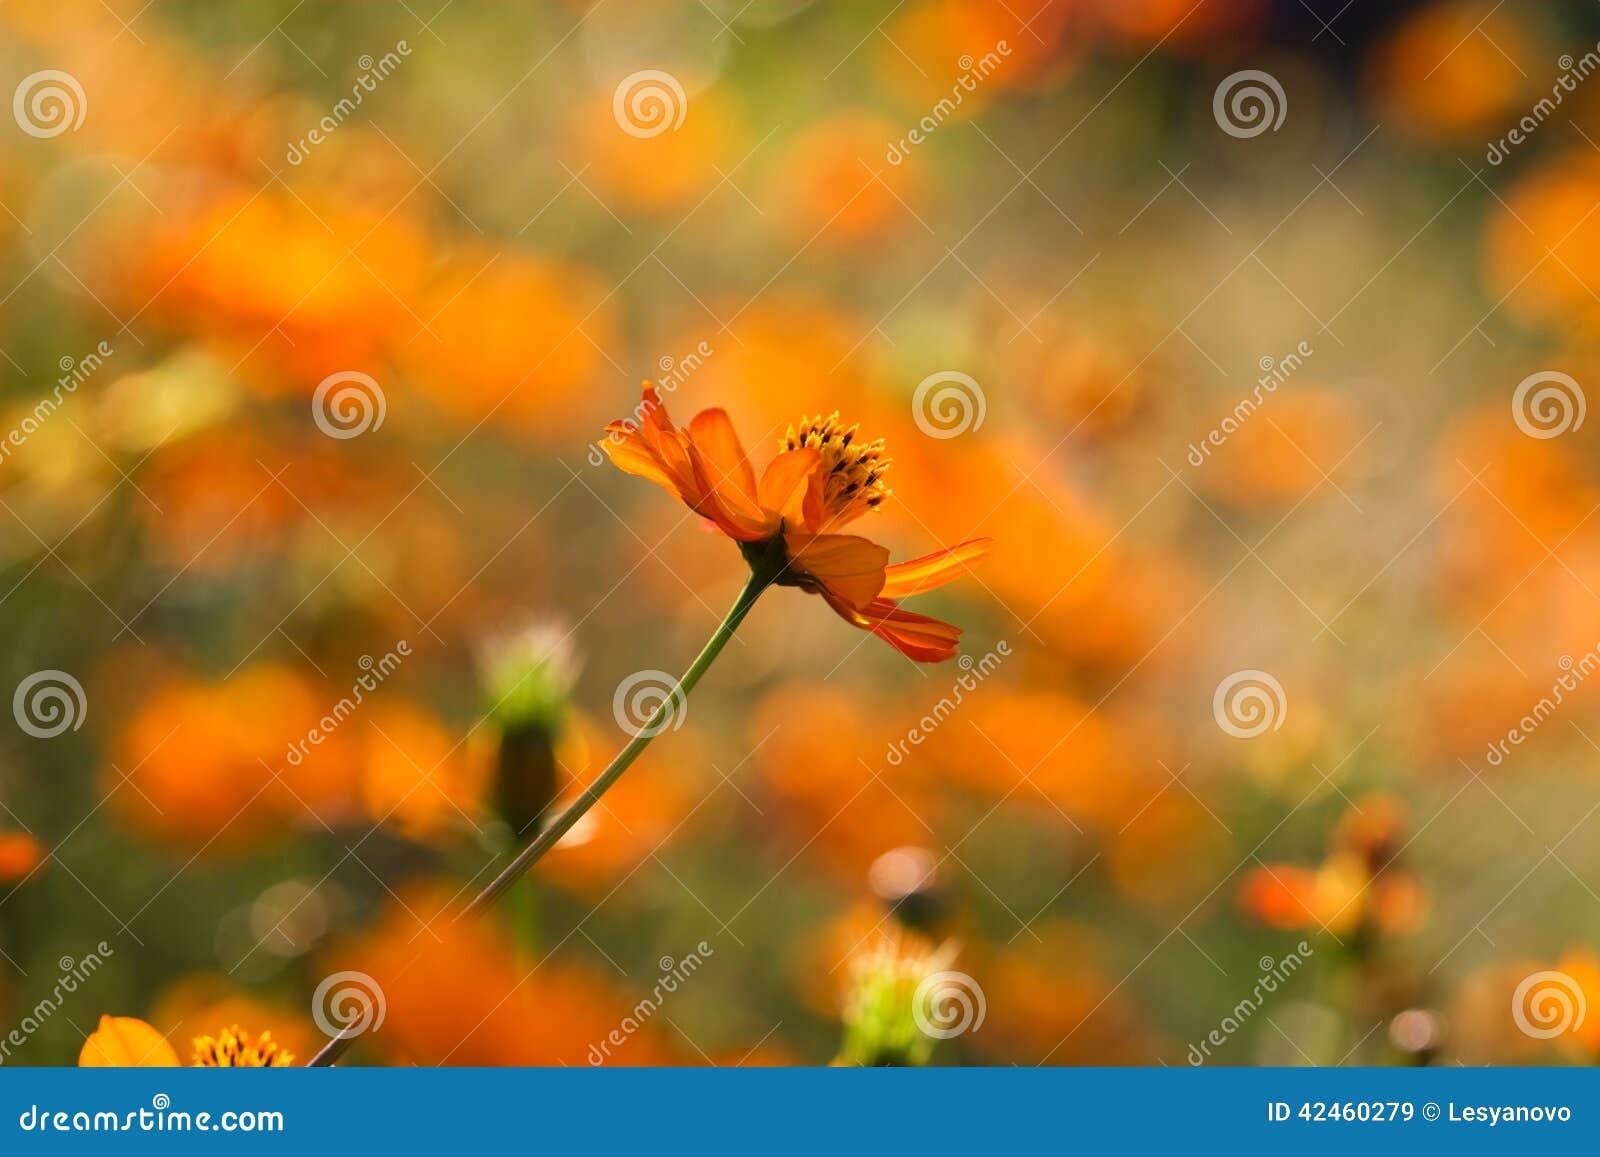 Helle orange Blume